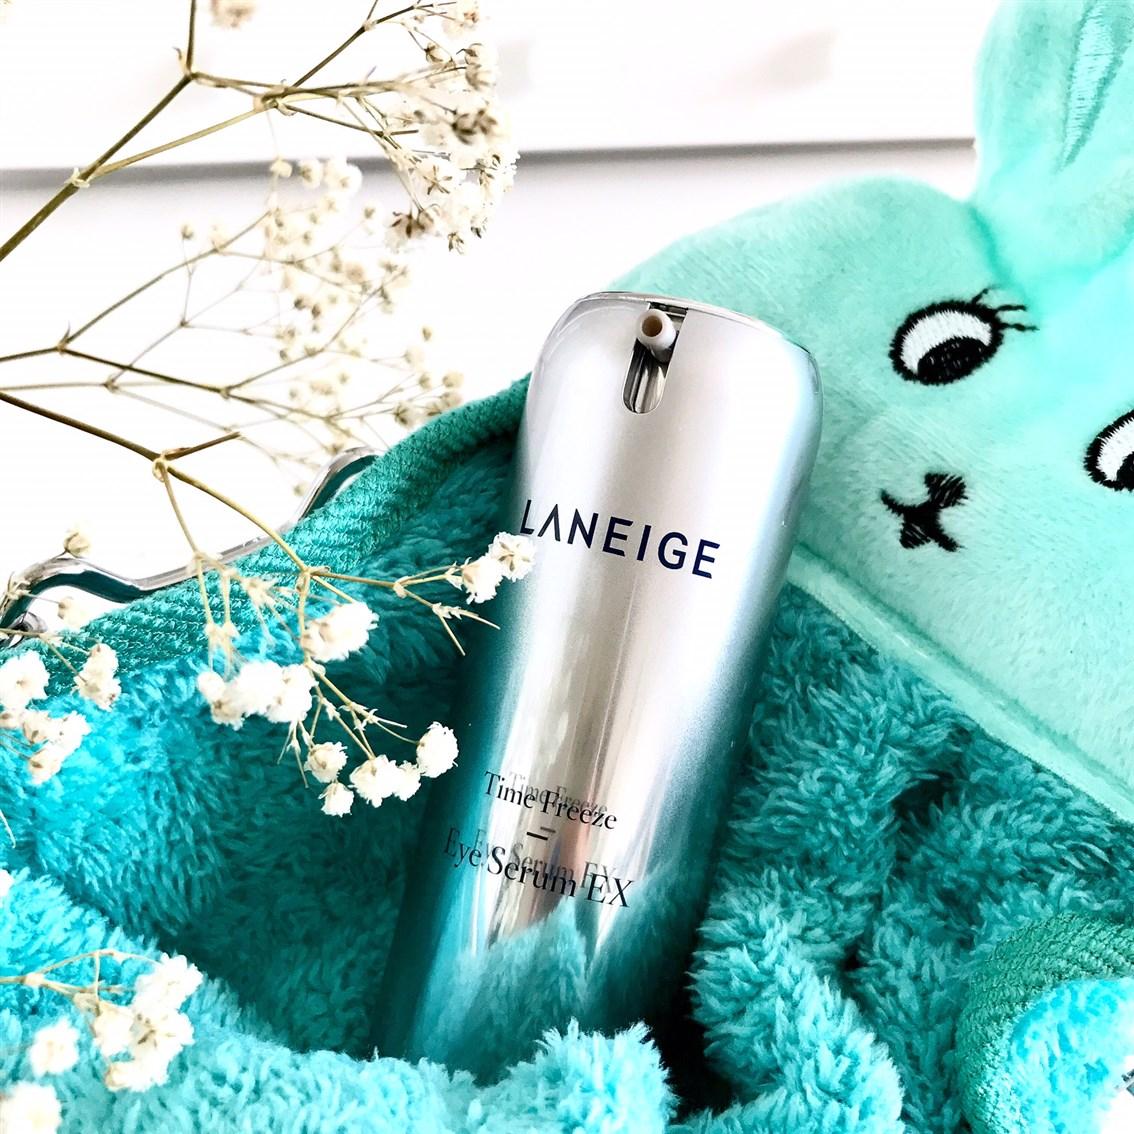 Laneige Time Freeze Eye Serum EX, Laneige esencja Time Freeze